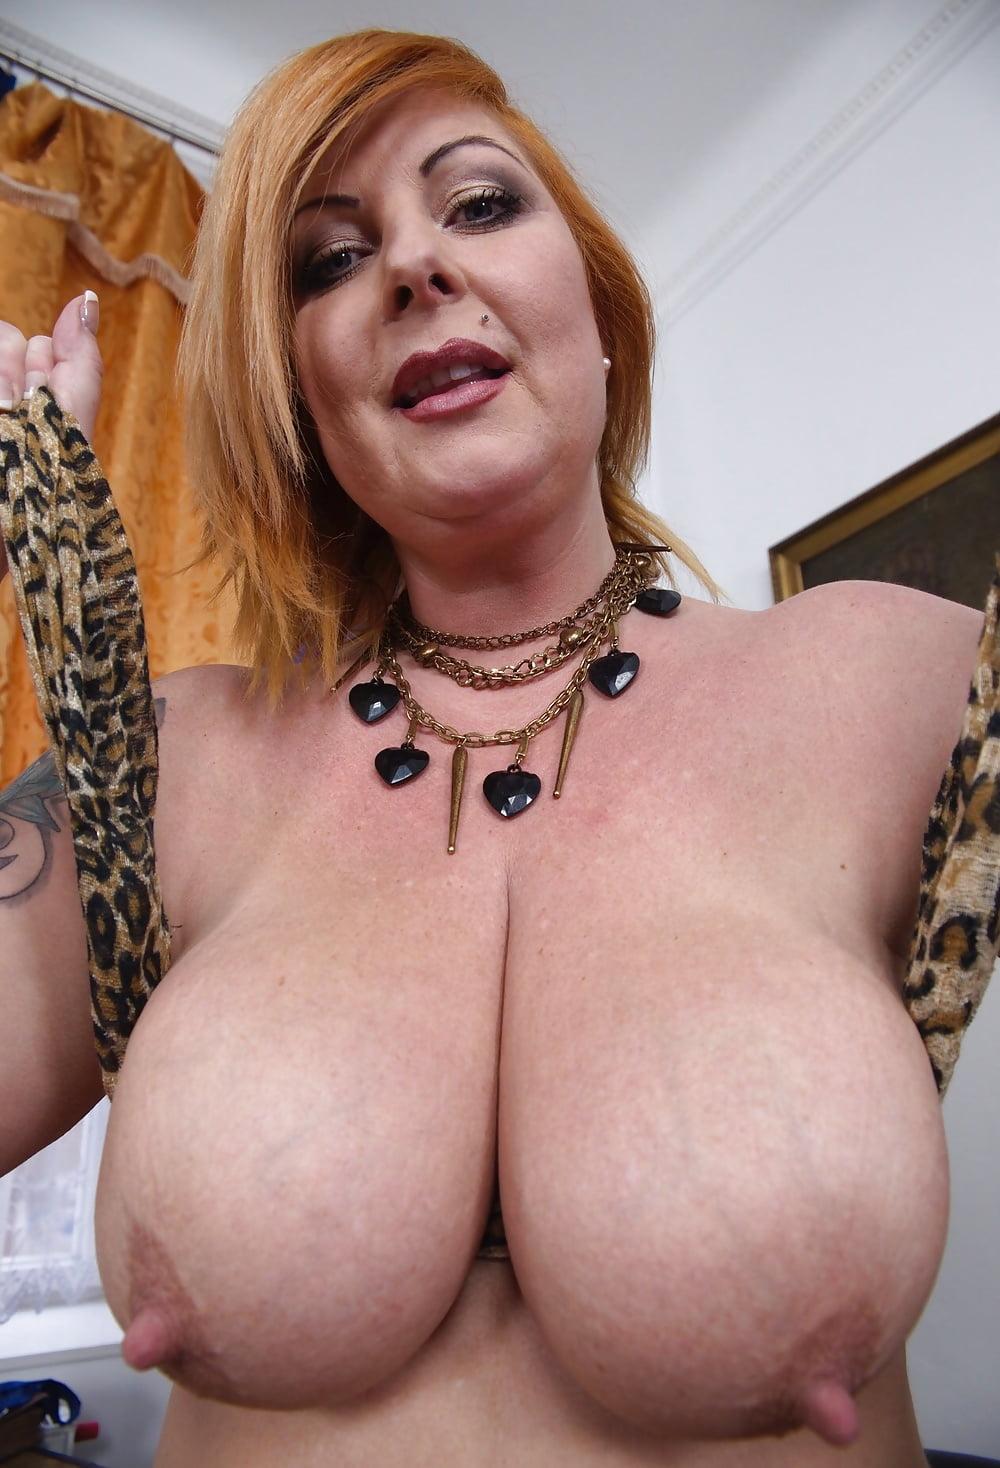 Huge breasted milf pics